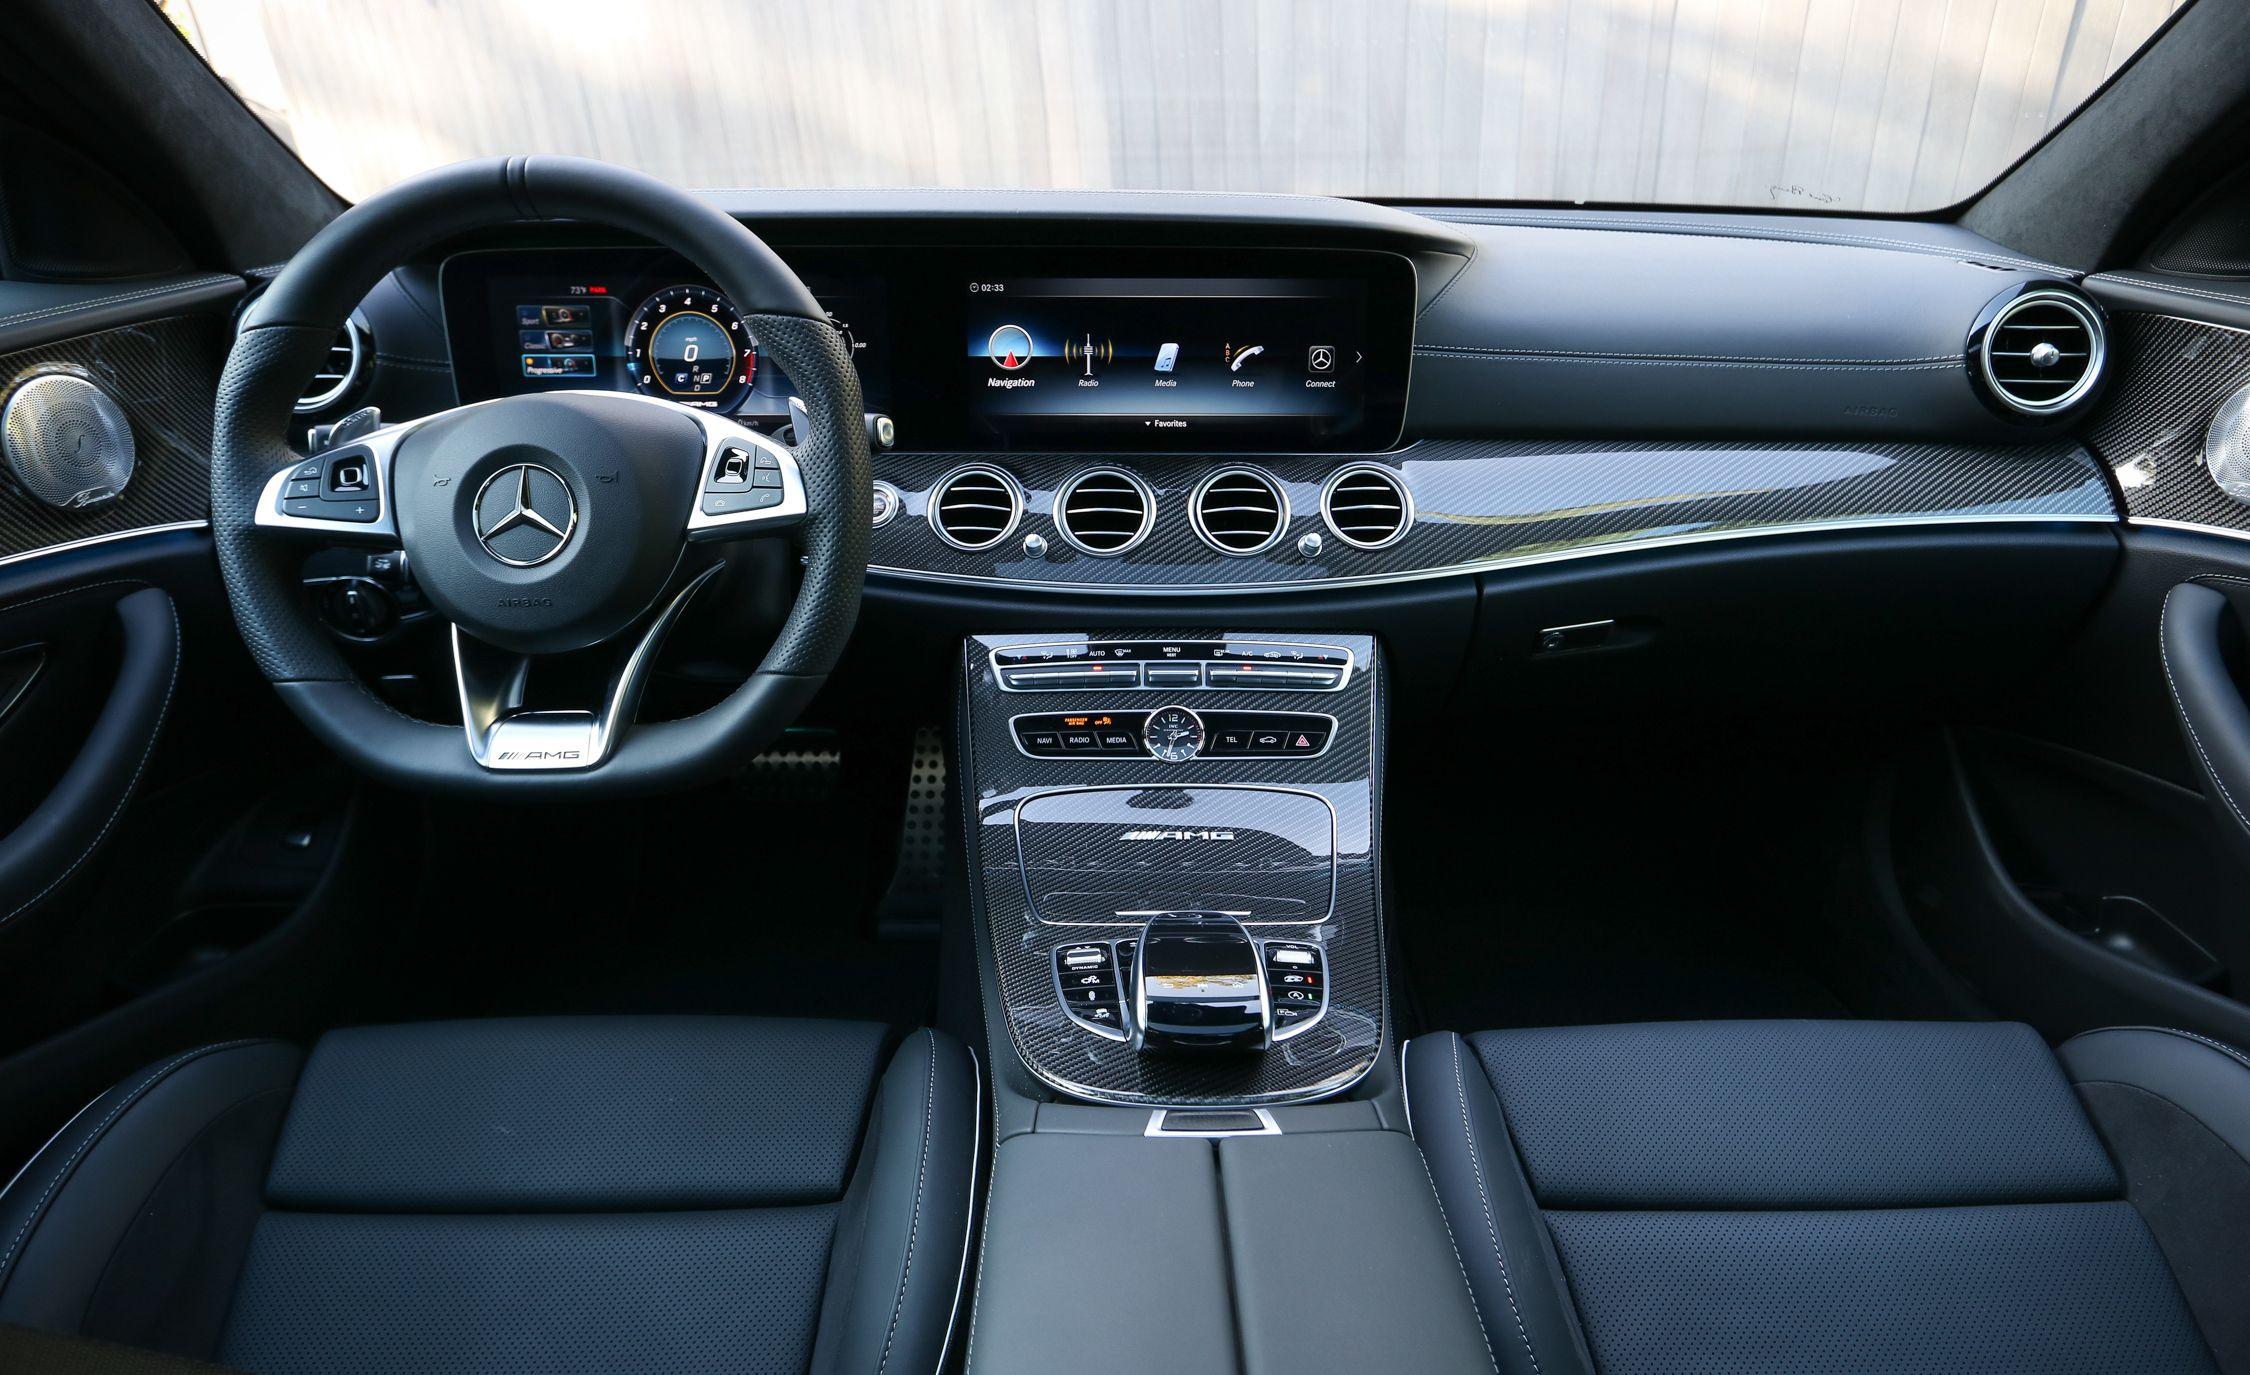 2018 Mercedes Amg E63 S Wagon Interior Cockpit Wallpapers Mercedes E63 Amg Wagon Interior 2250x1375 Wallpaper Teahub Io